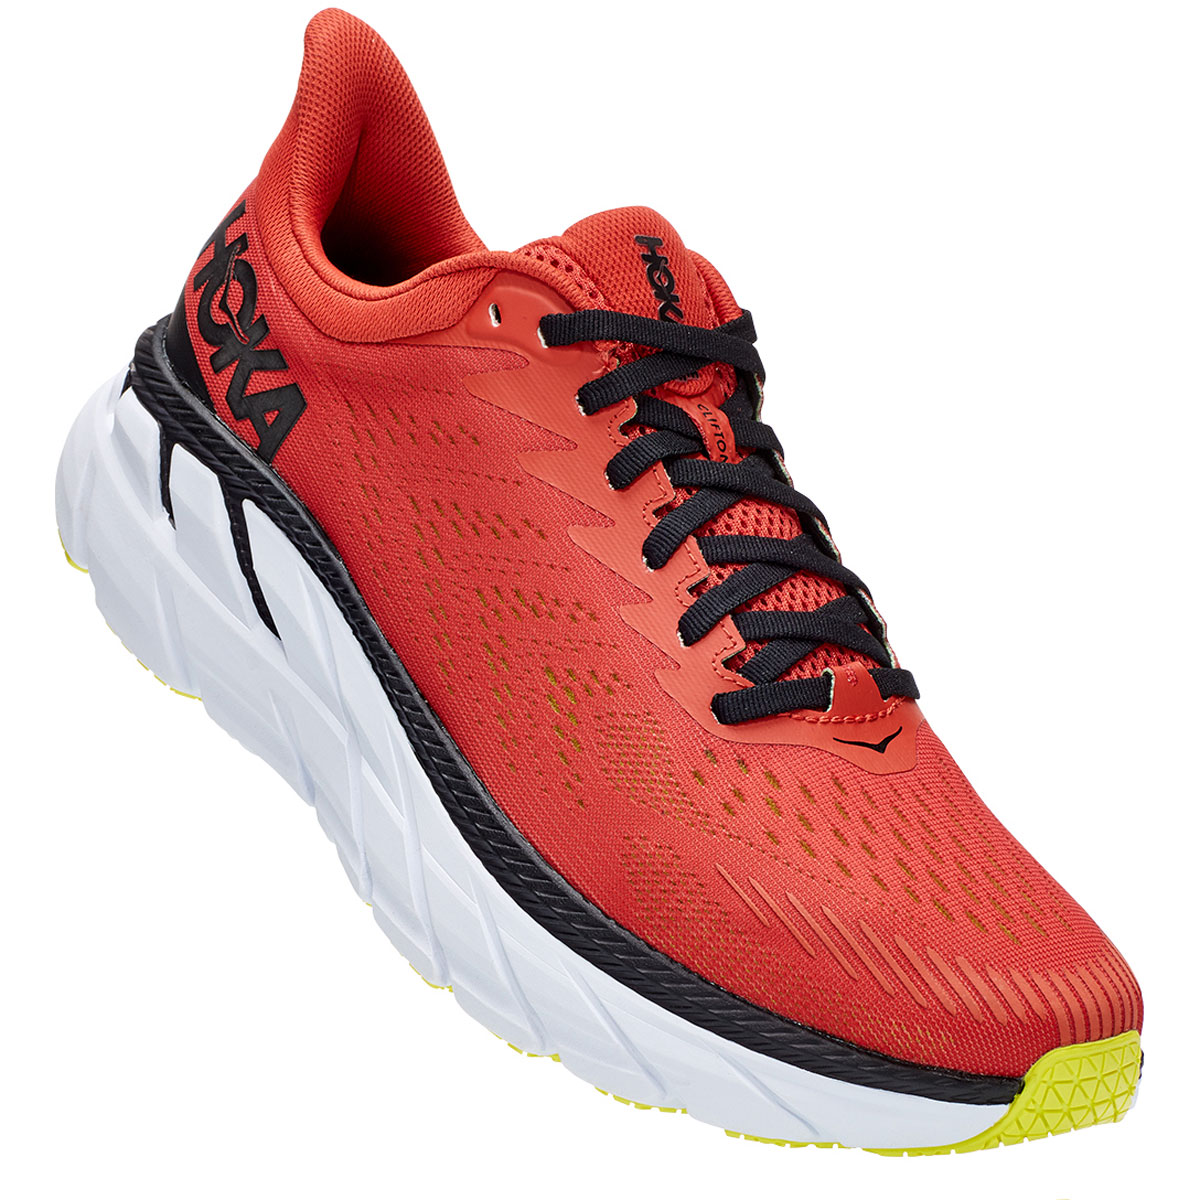 Men's Hoka One One Clifton 7 Running Shoe - Color: Chili/Black - Size: 9 - Width: Regular, Chili/Black, large, image 4